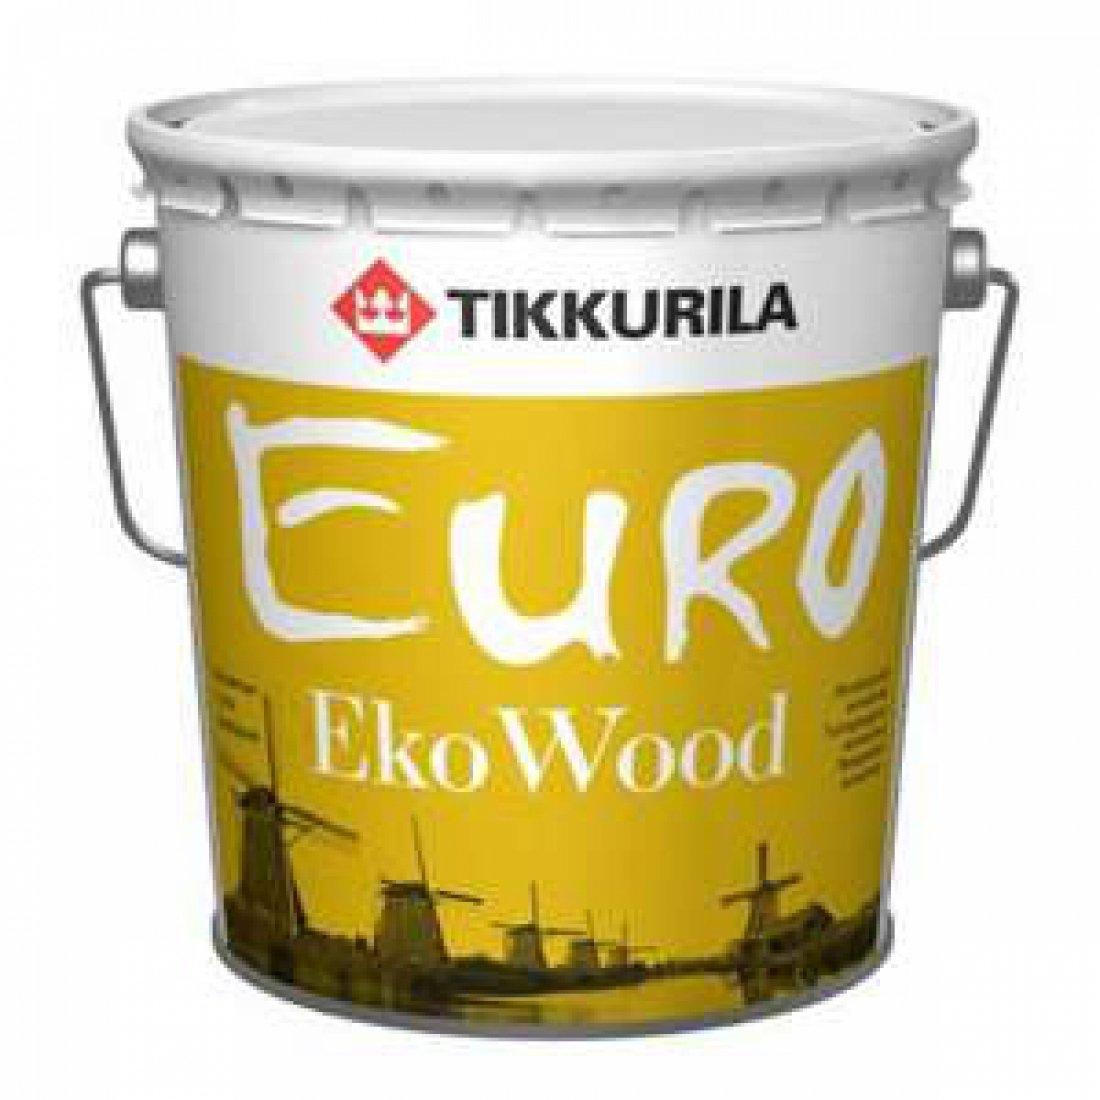 TIKKURILA EURO EKO WOOD антисептик лессирующий, бесцветный (9л)